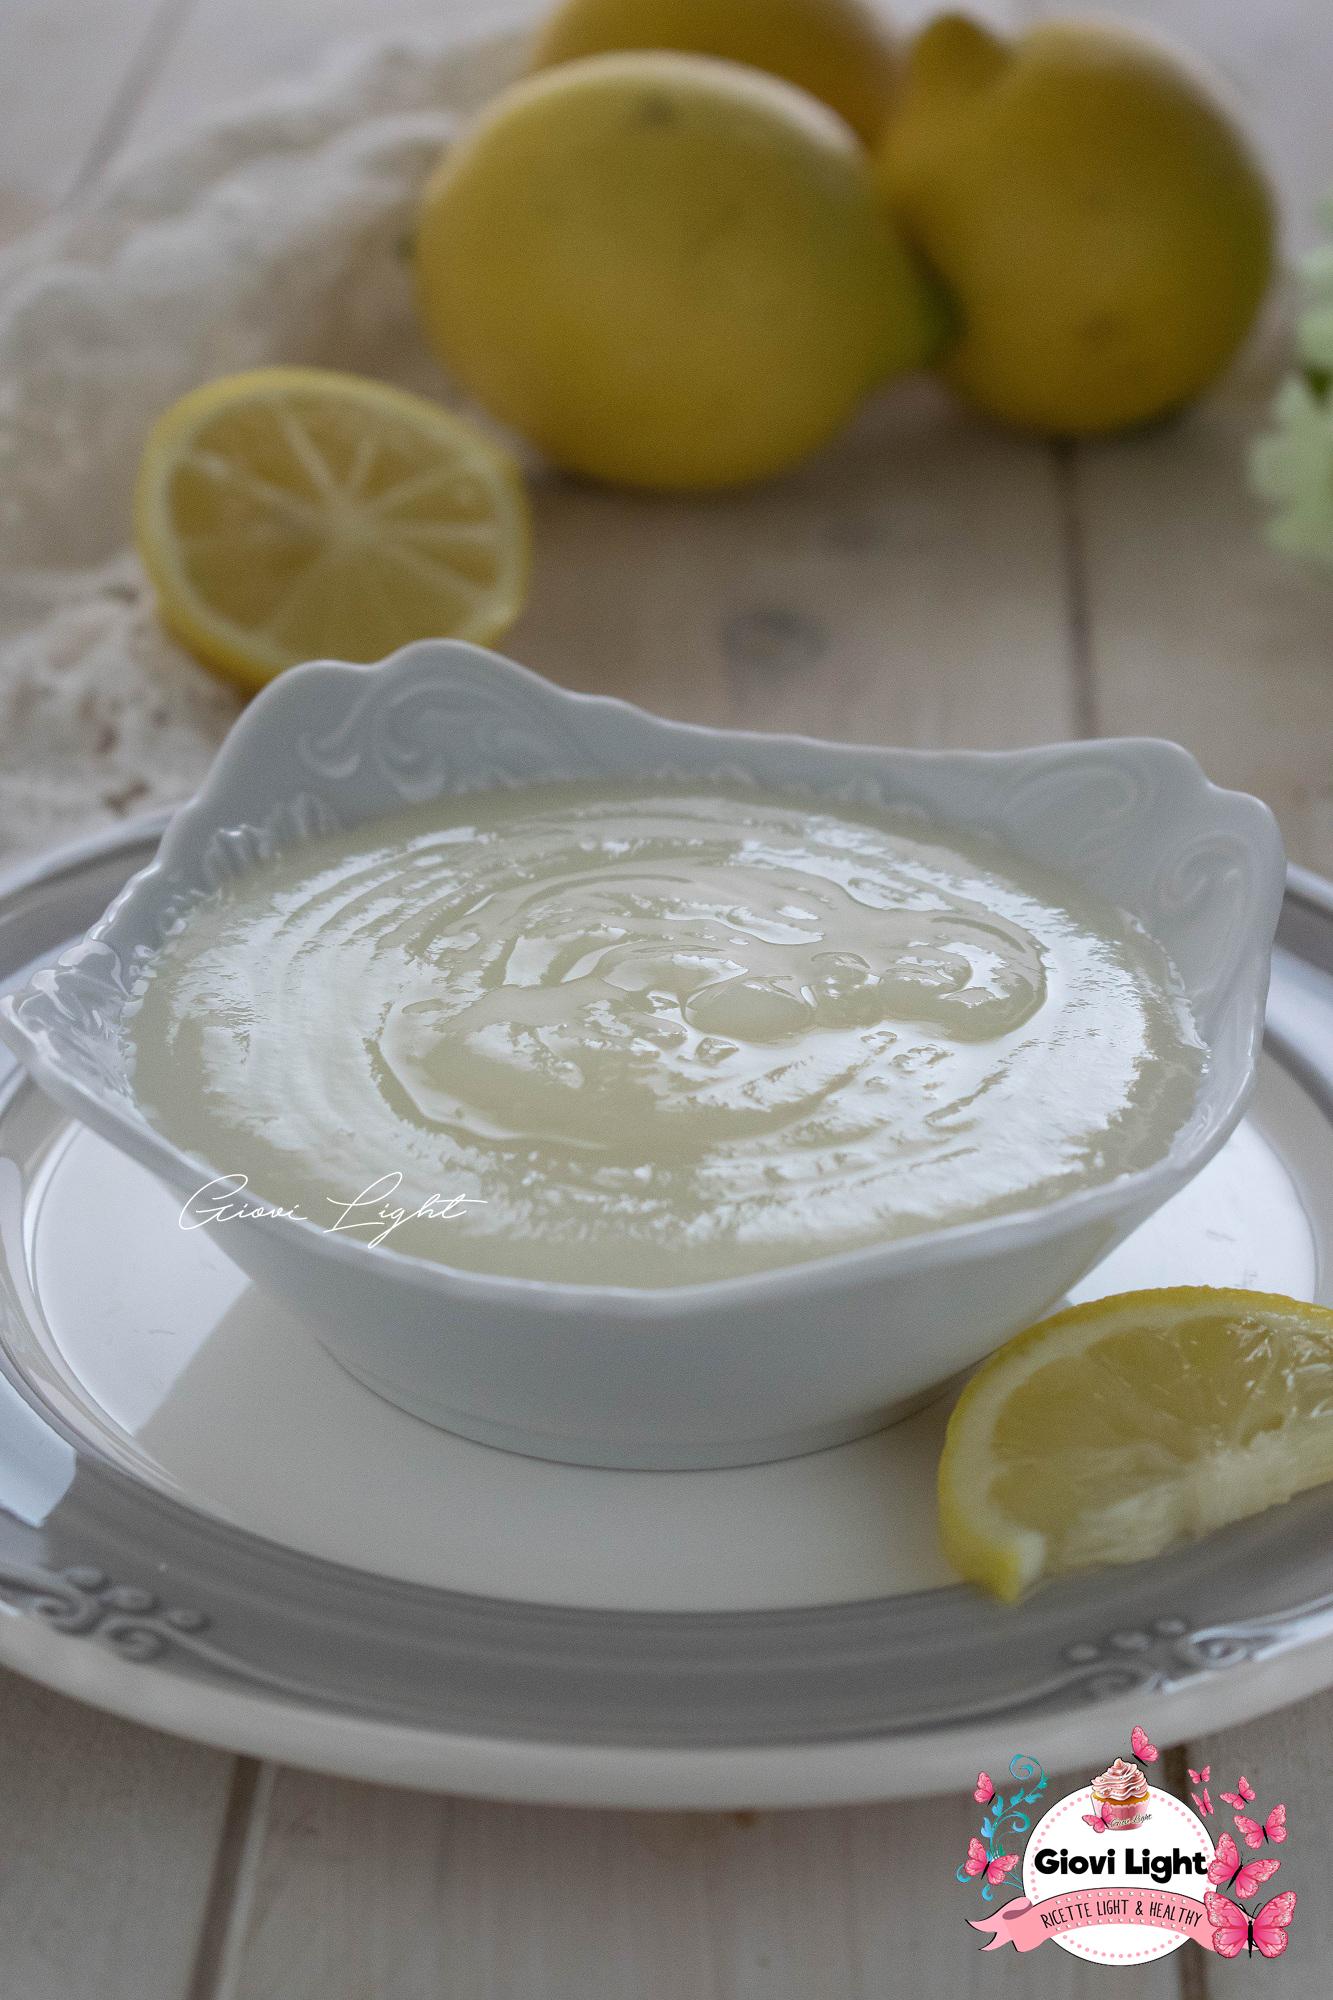 Glassa al limone light